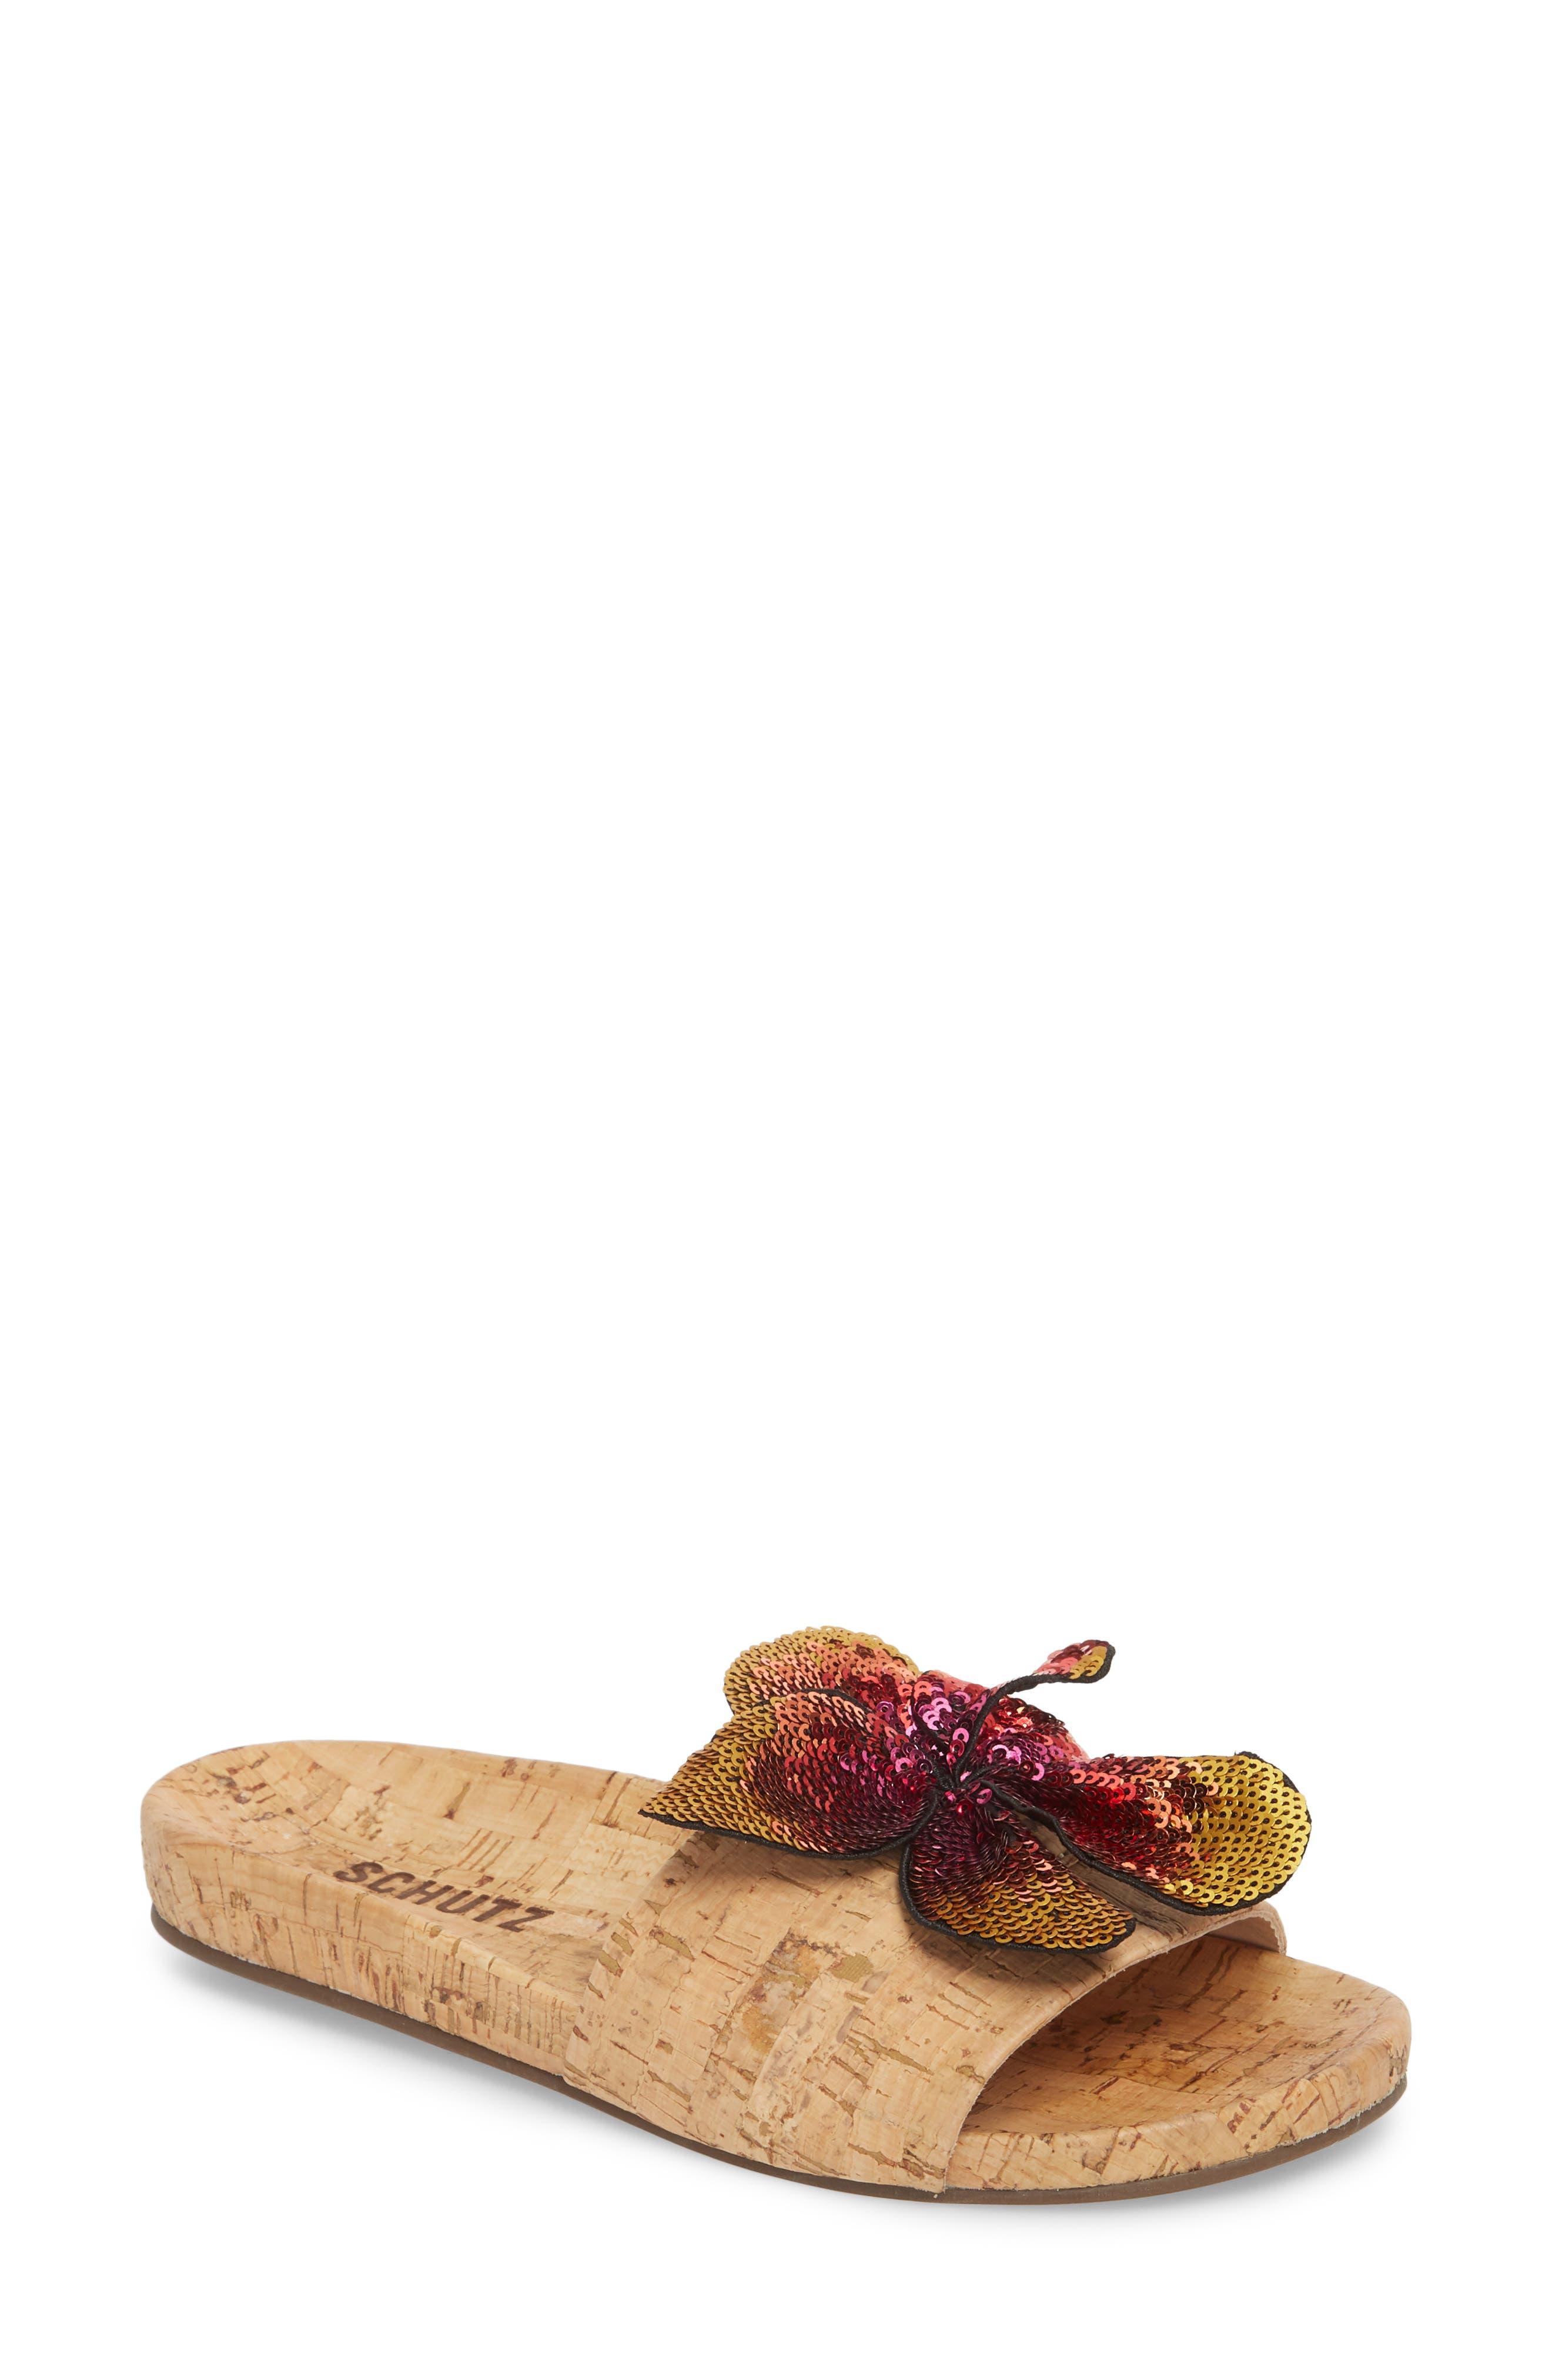 Schutz Geisa Sequin Flower Slide Sandal, Beige